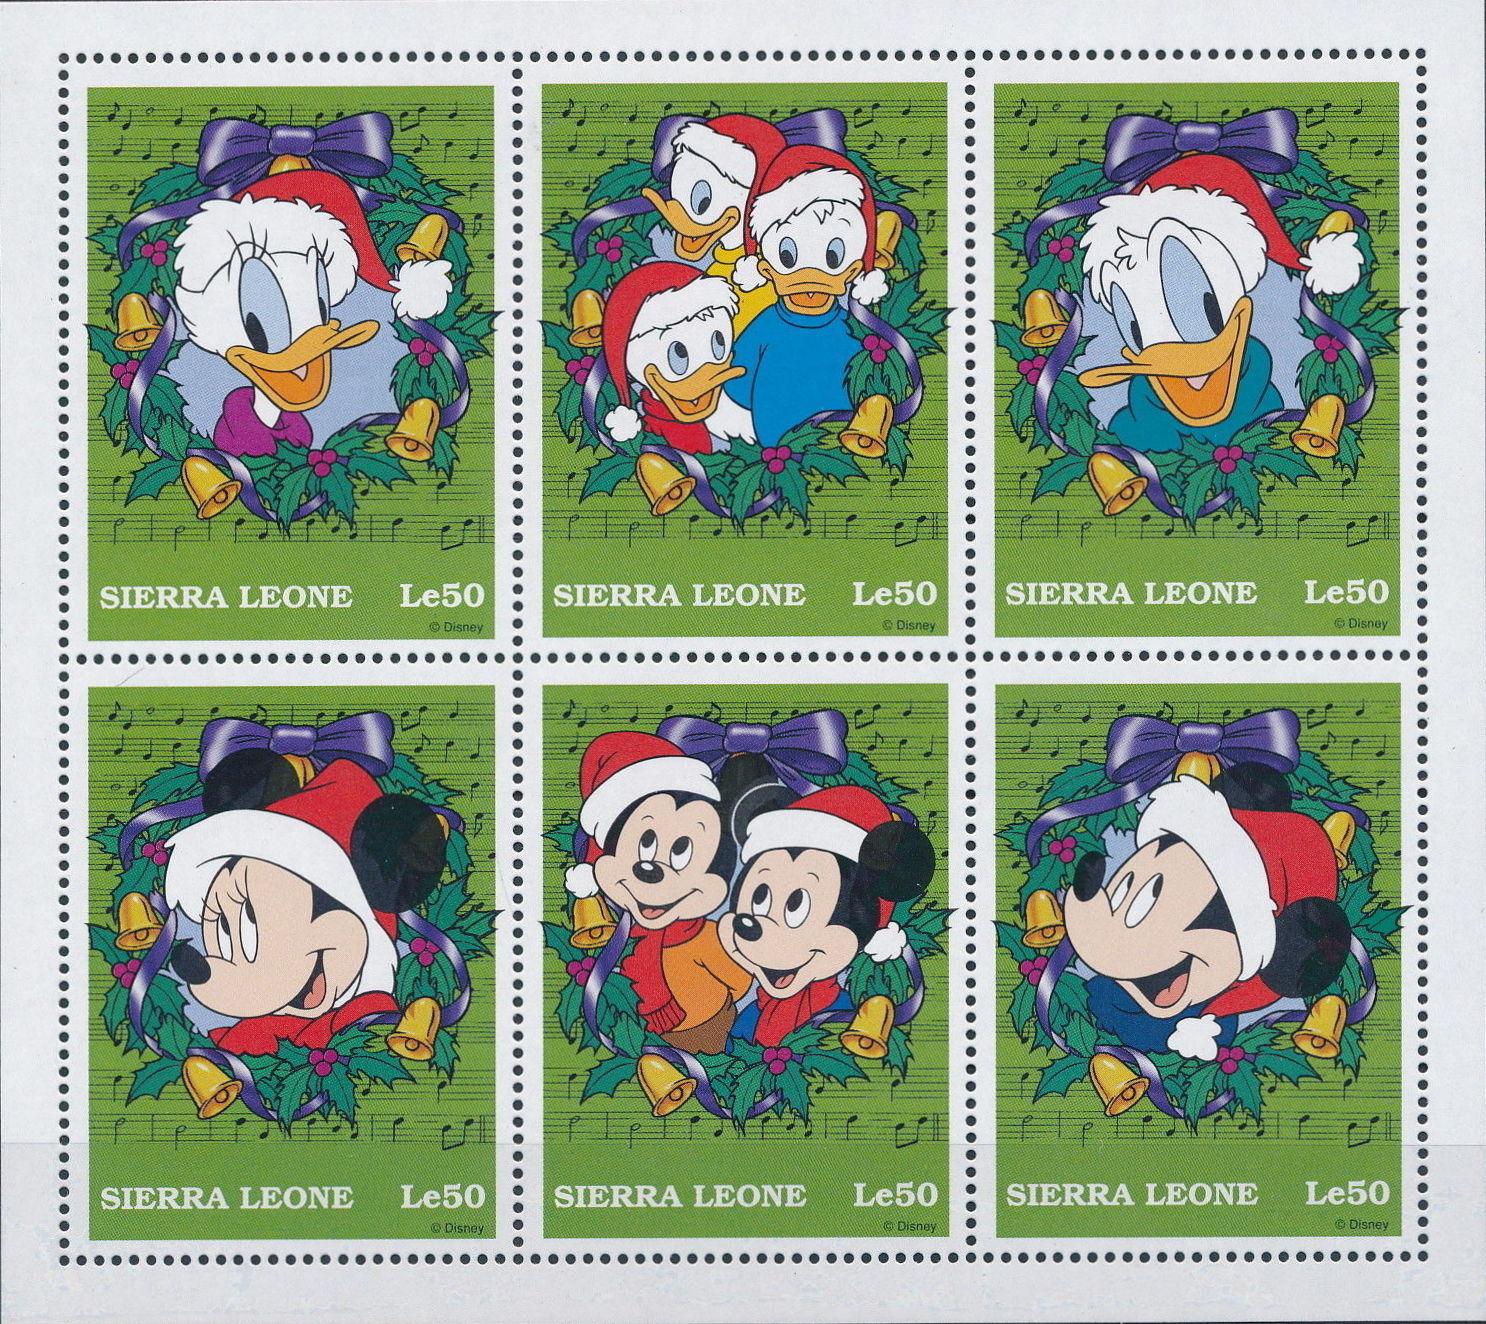 Sierra Leone 1997 Disney Christmas Stamps Sa.jpg